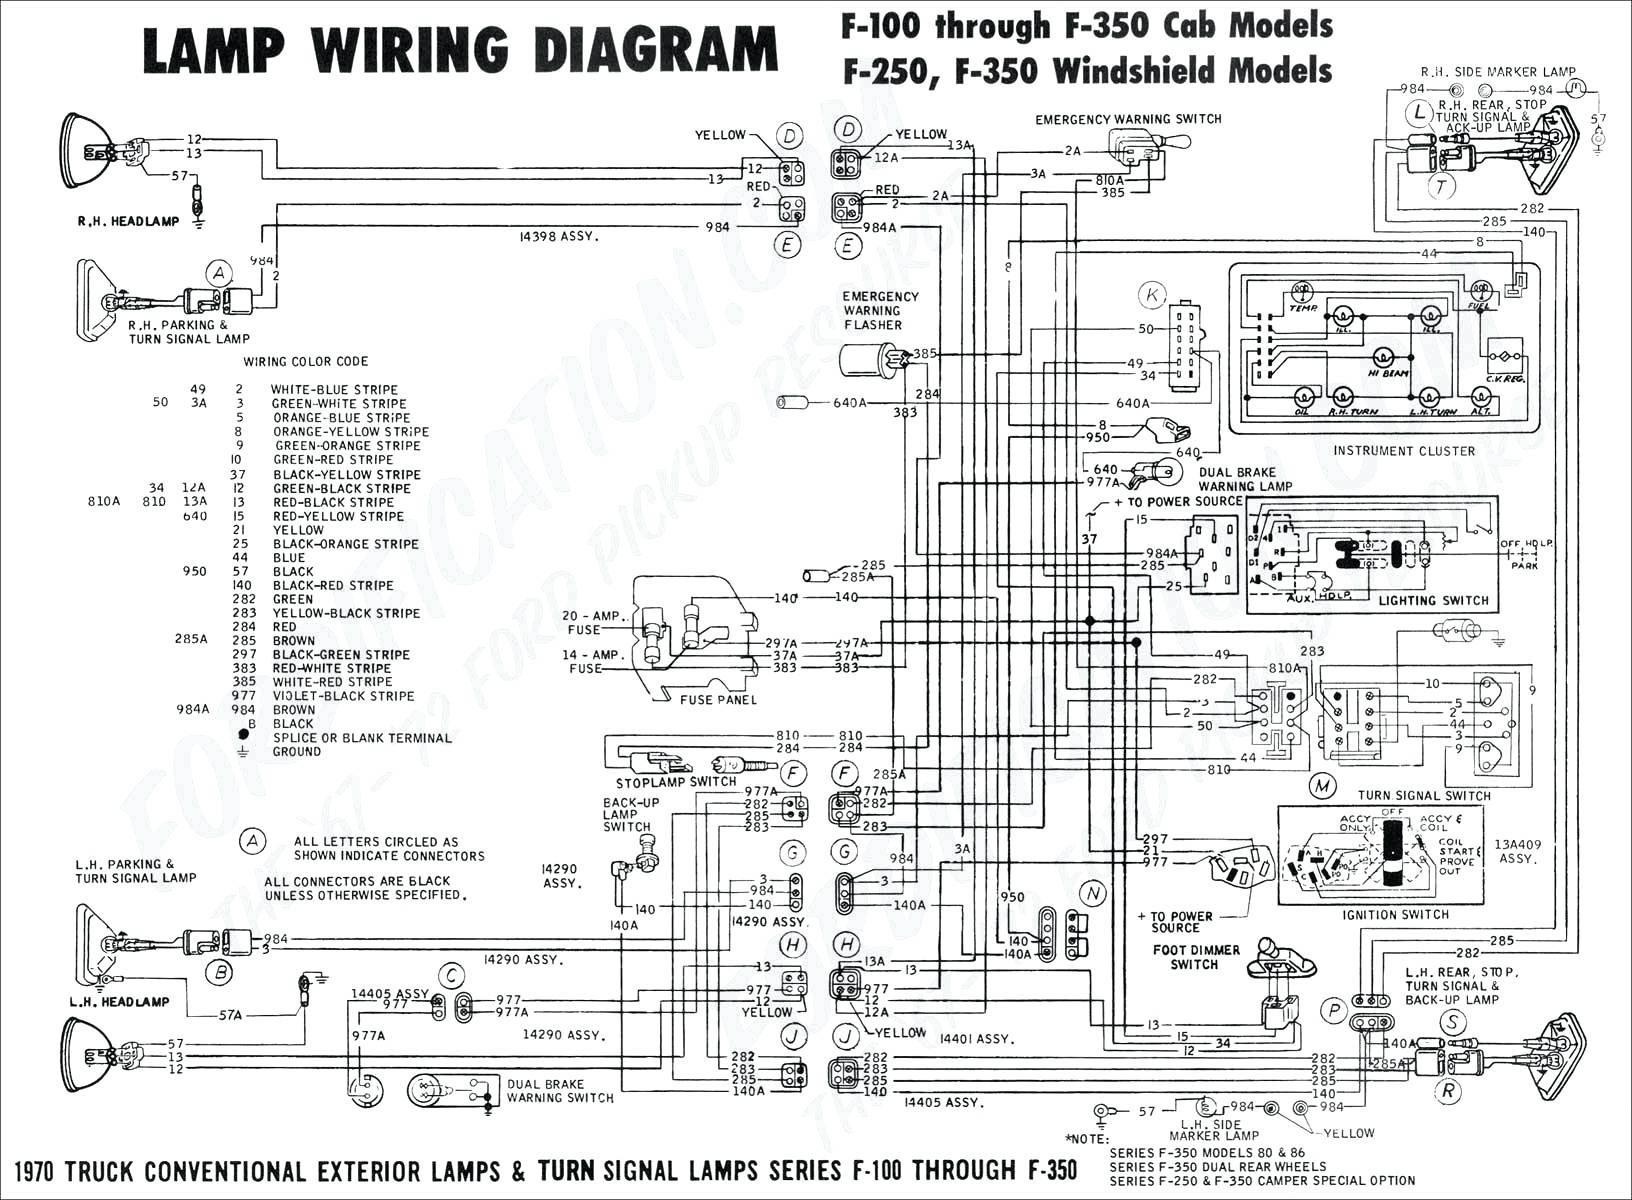 brake light wire diagram audi a4 tail light wiring diagram